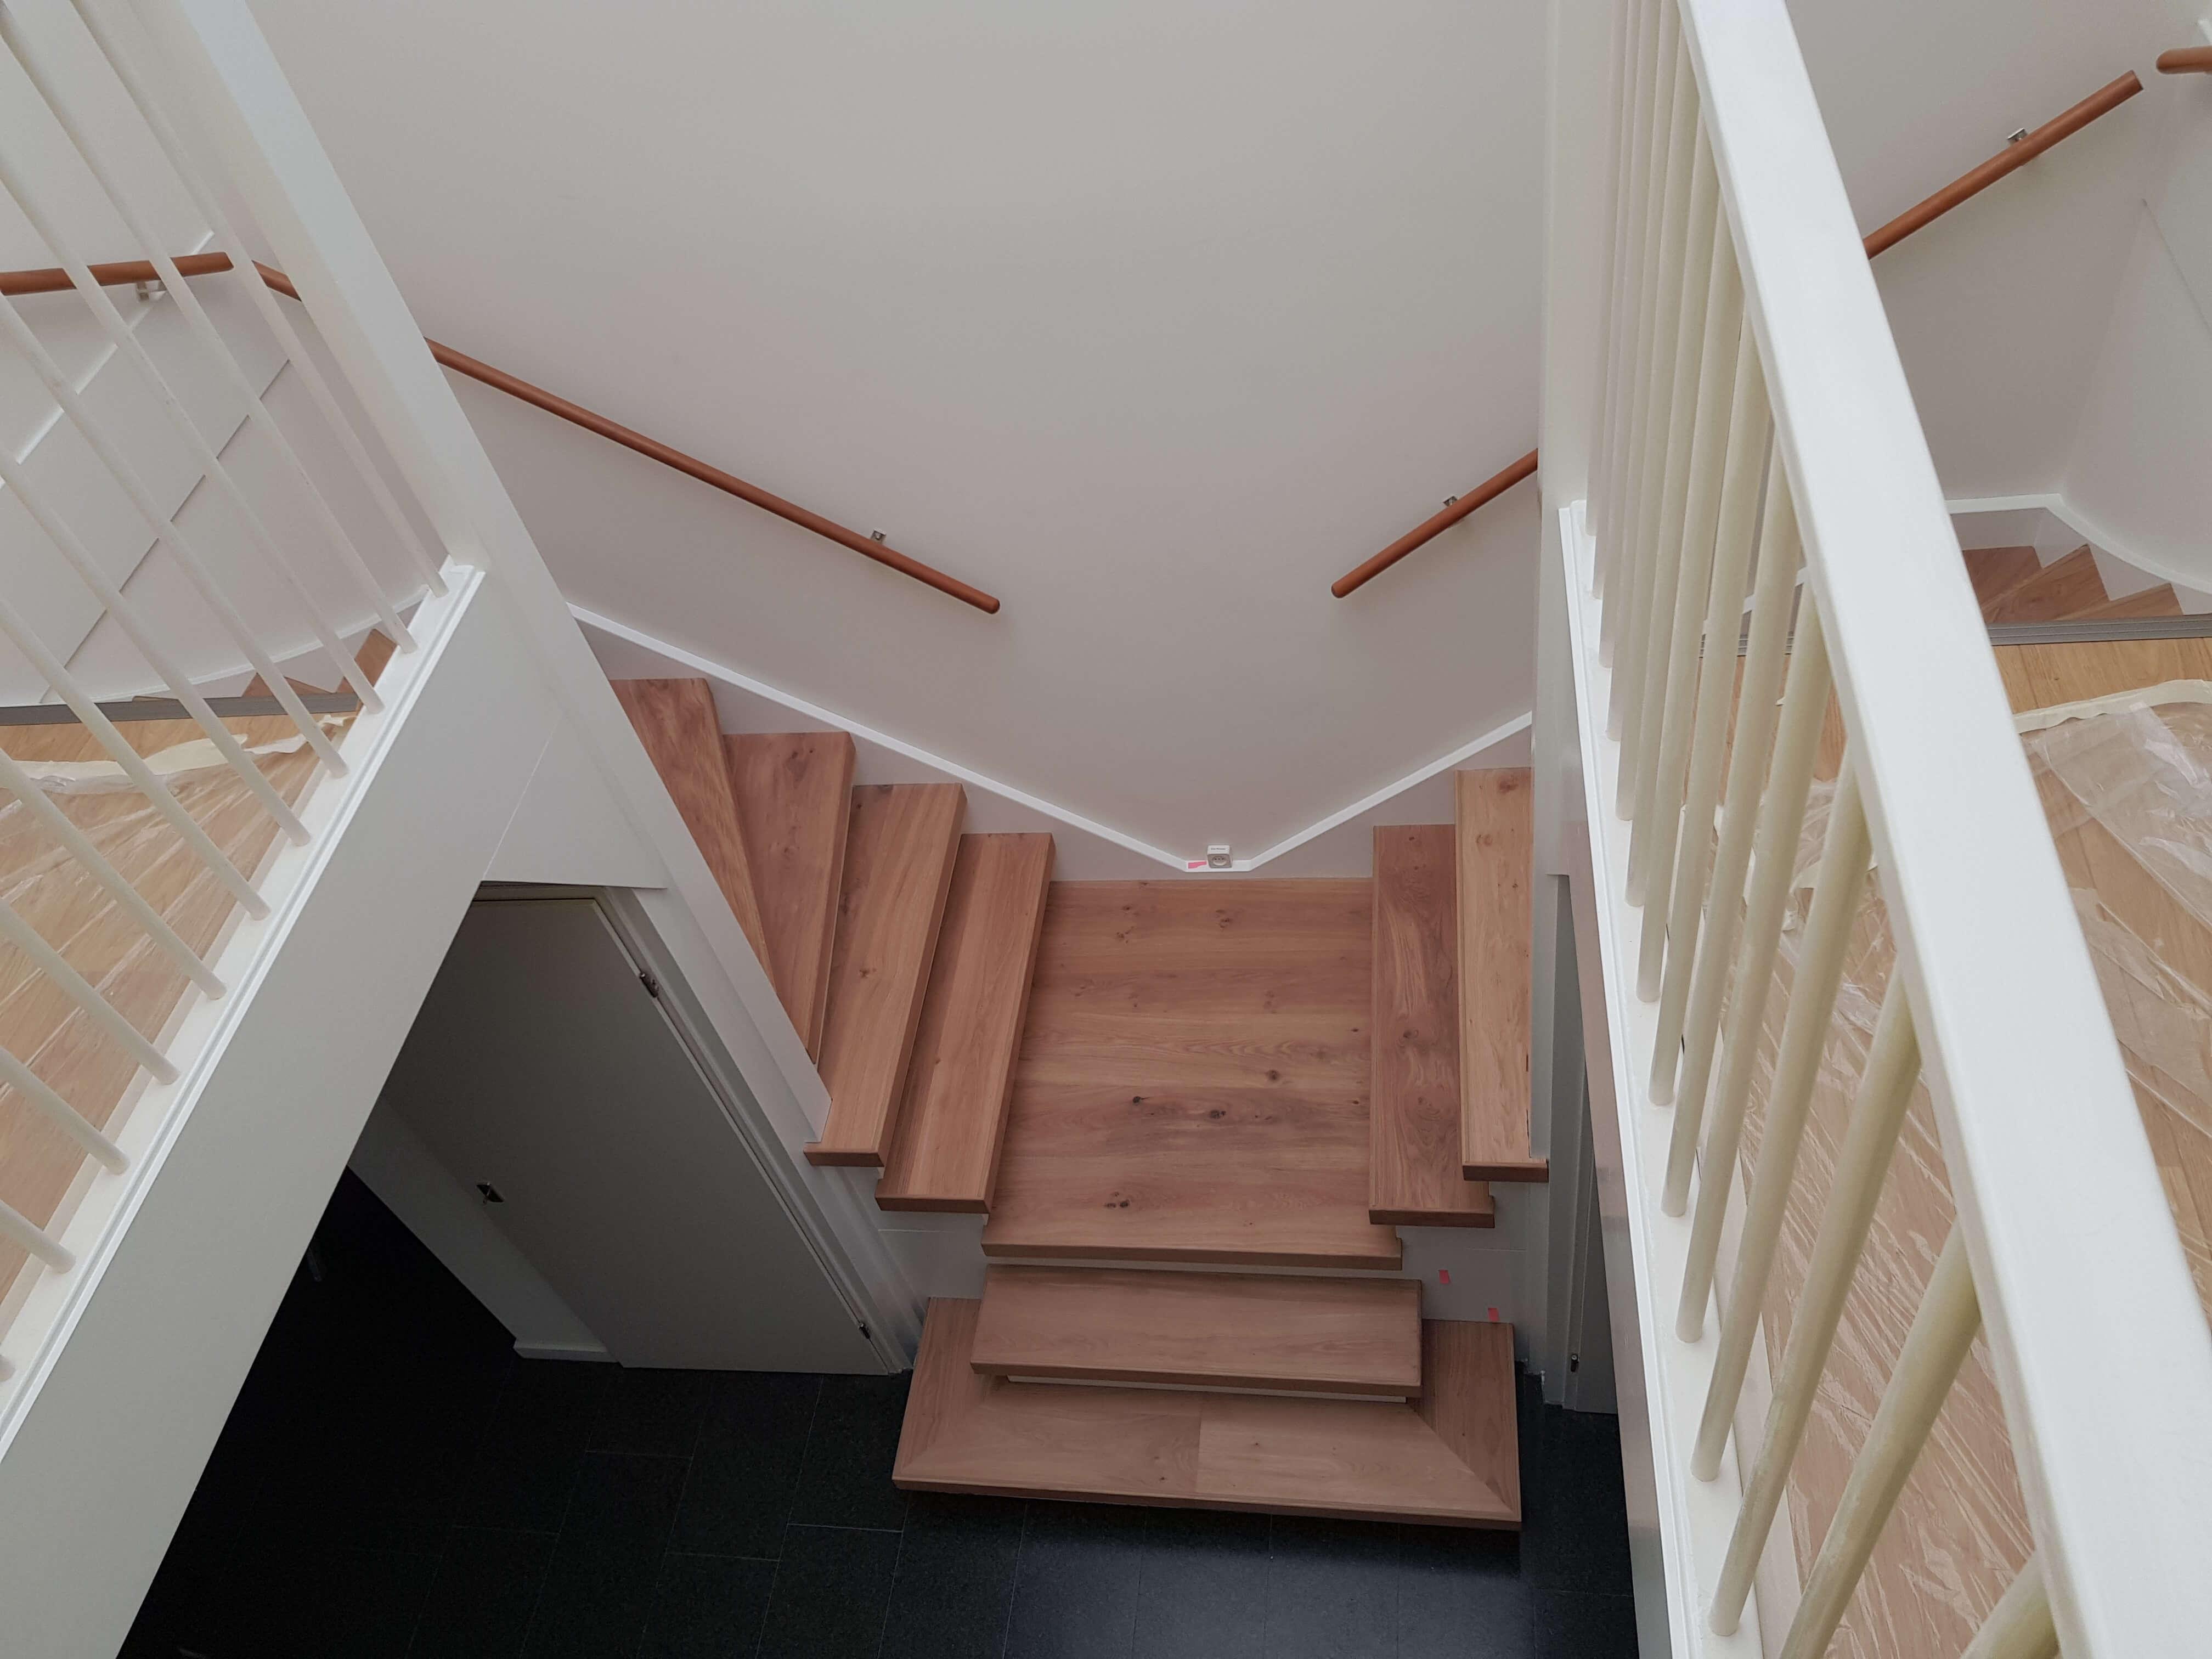 Goedkoop trap bekleden rotterdam goedkope meubels